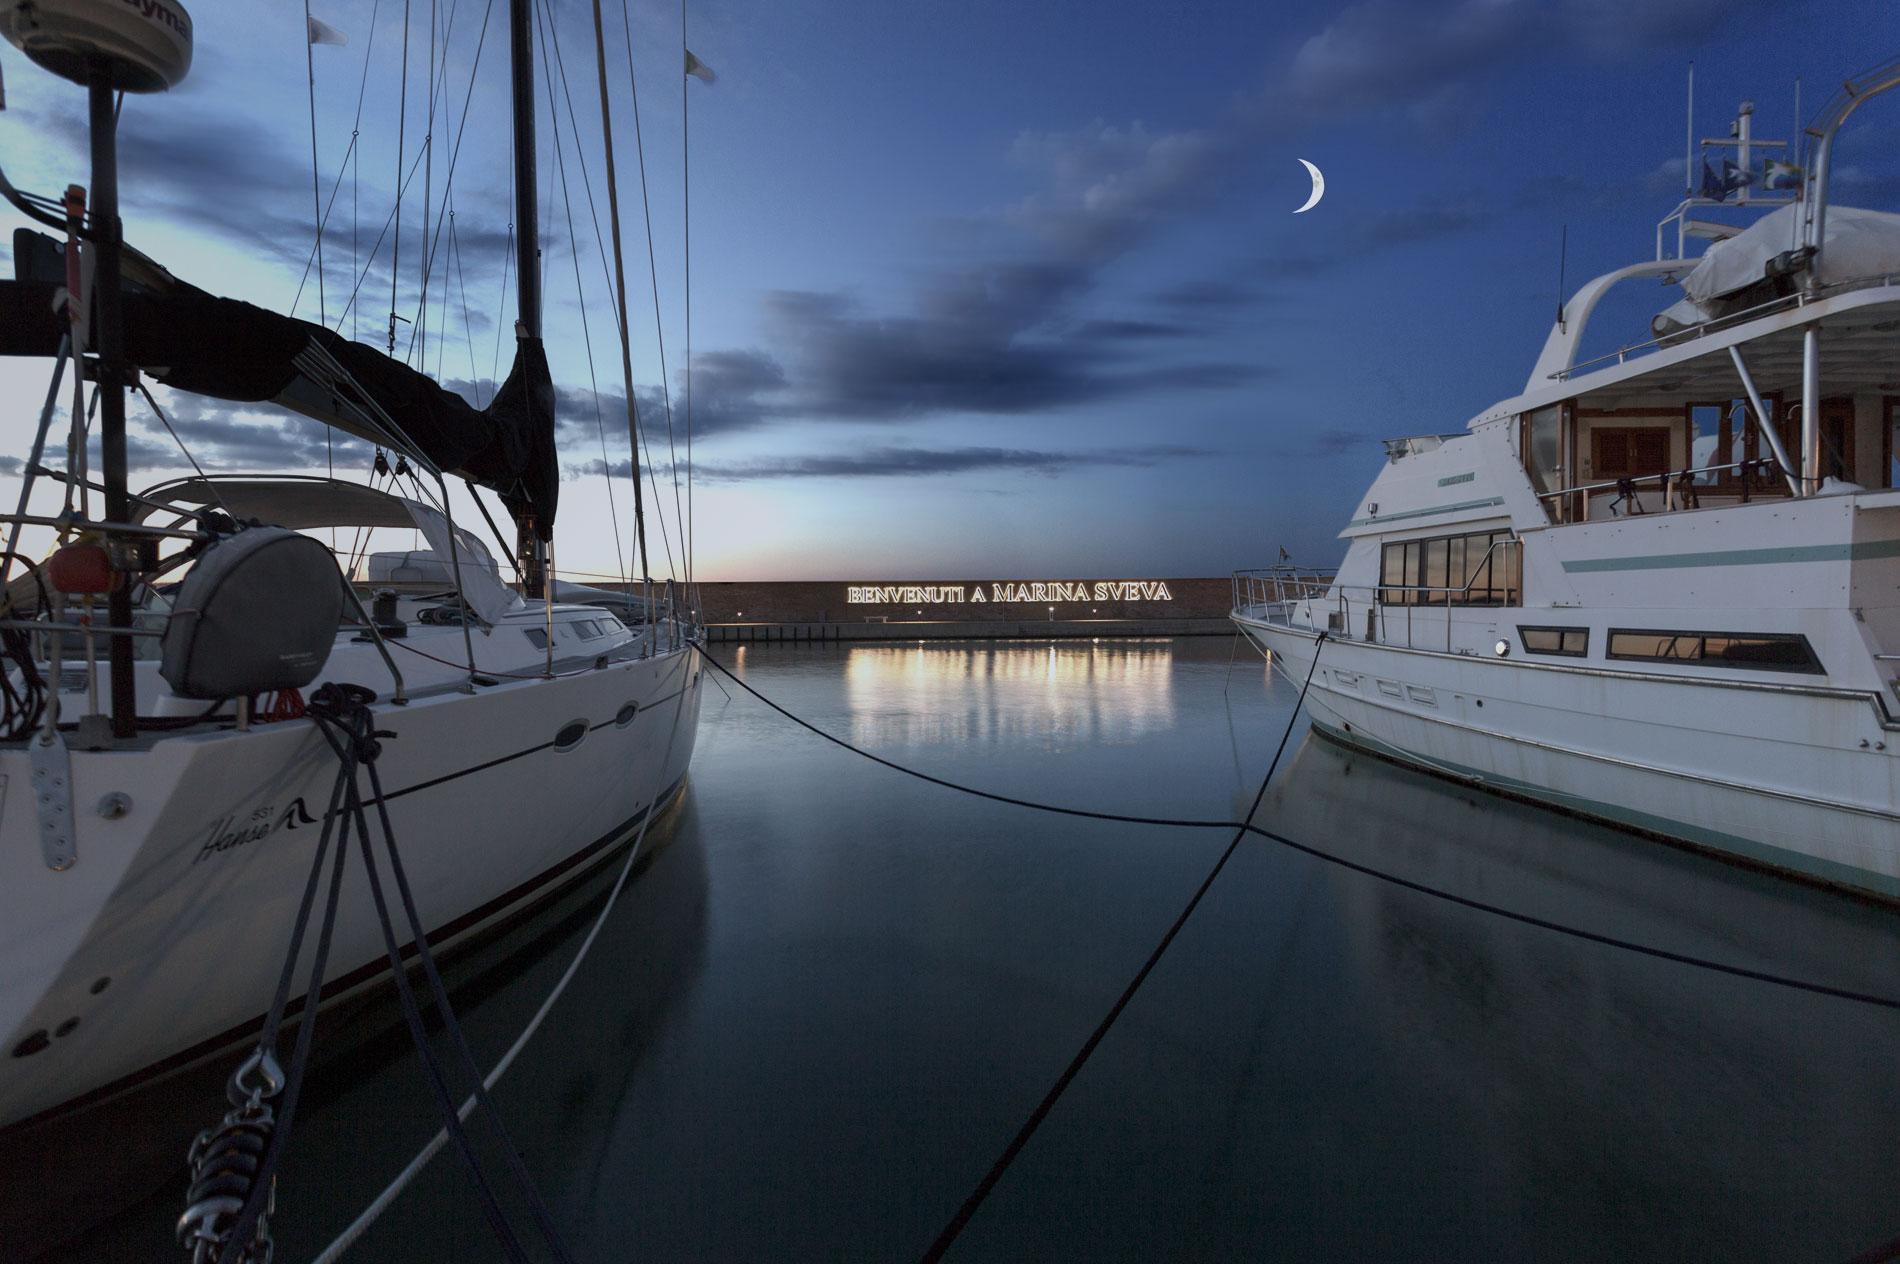 Porto-turistico-Marina-Sveva-Molise-H00